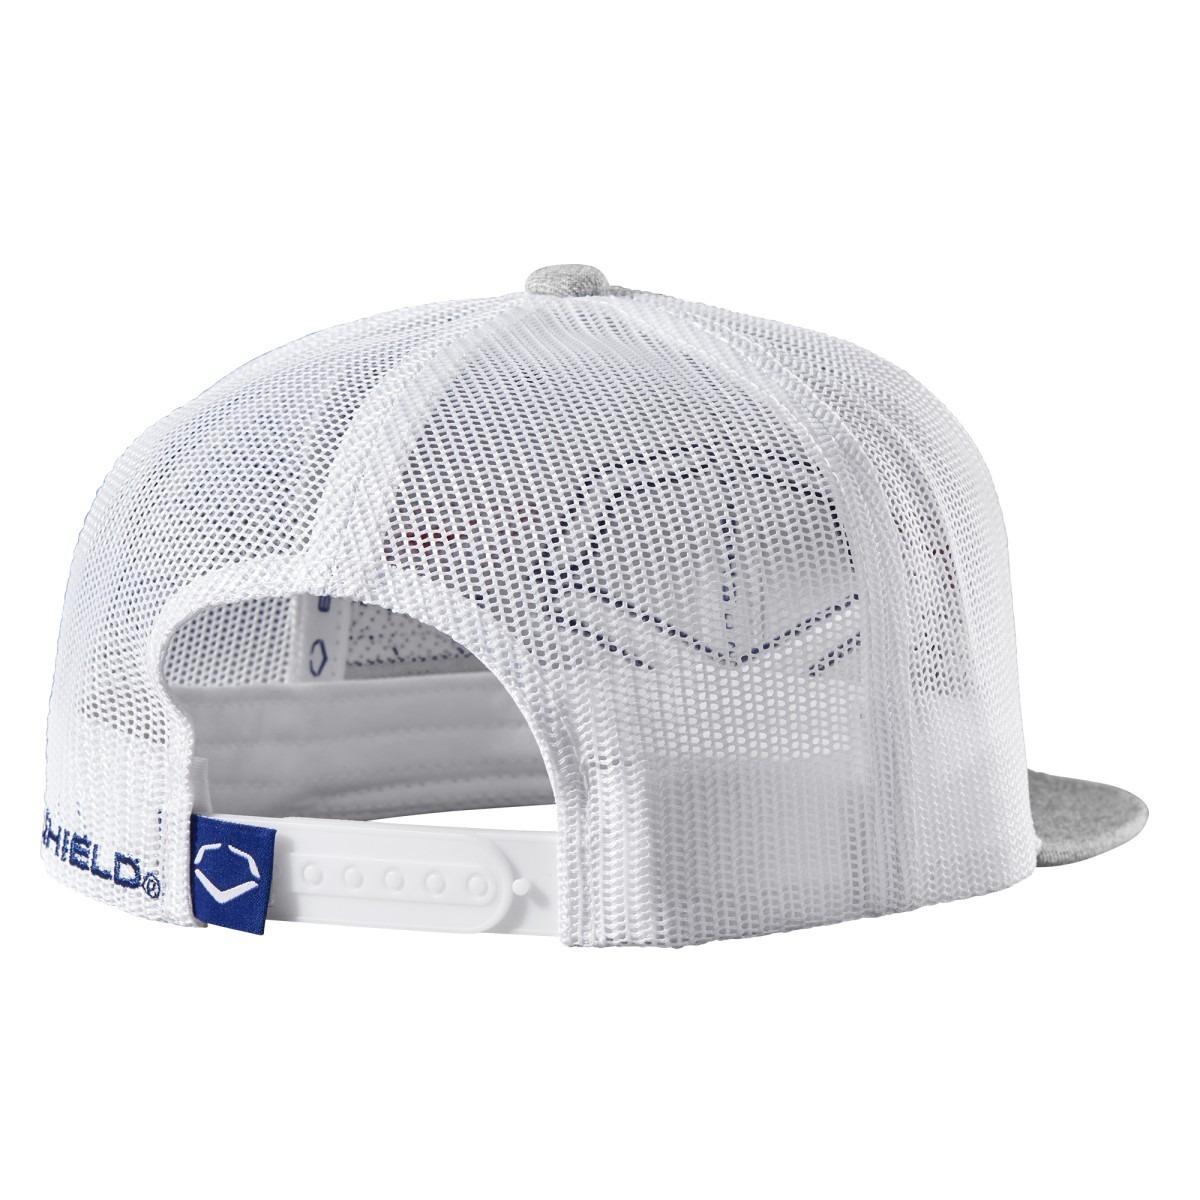 Evoshield Sentry Snapback Gorra Béisbol Ajustable -   649.00 en ... 614ccce46c9